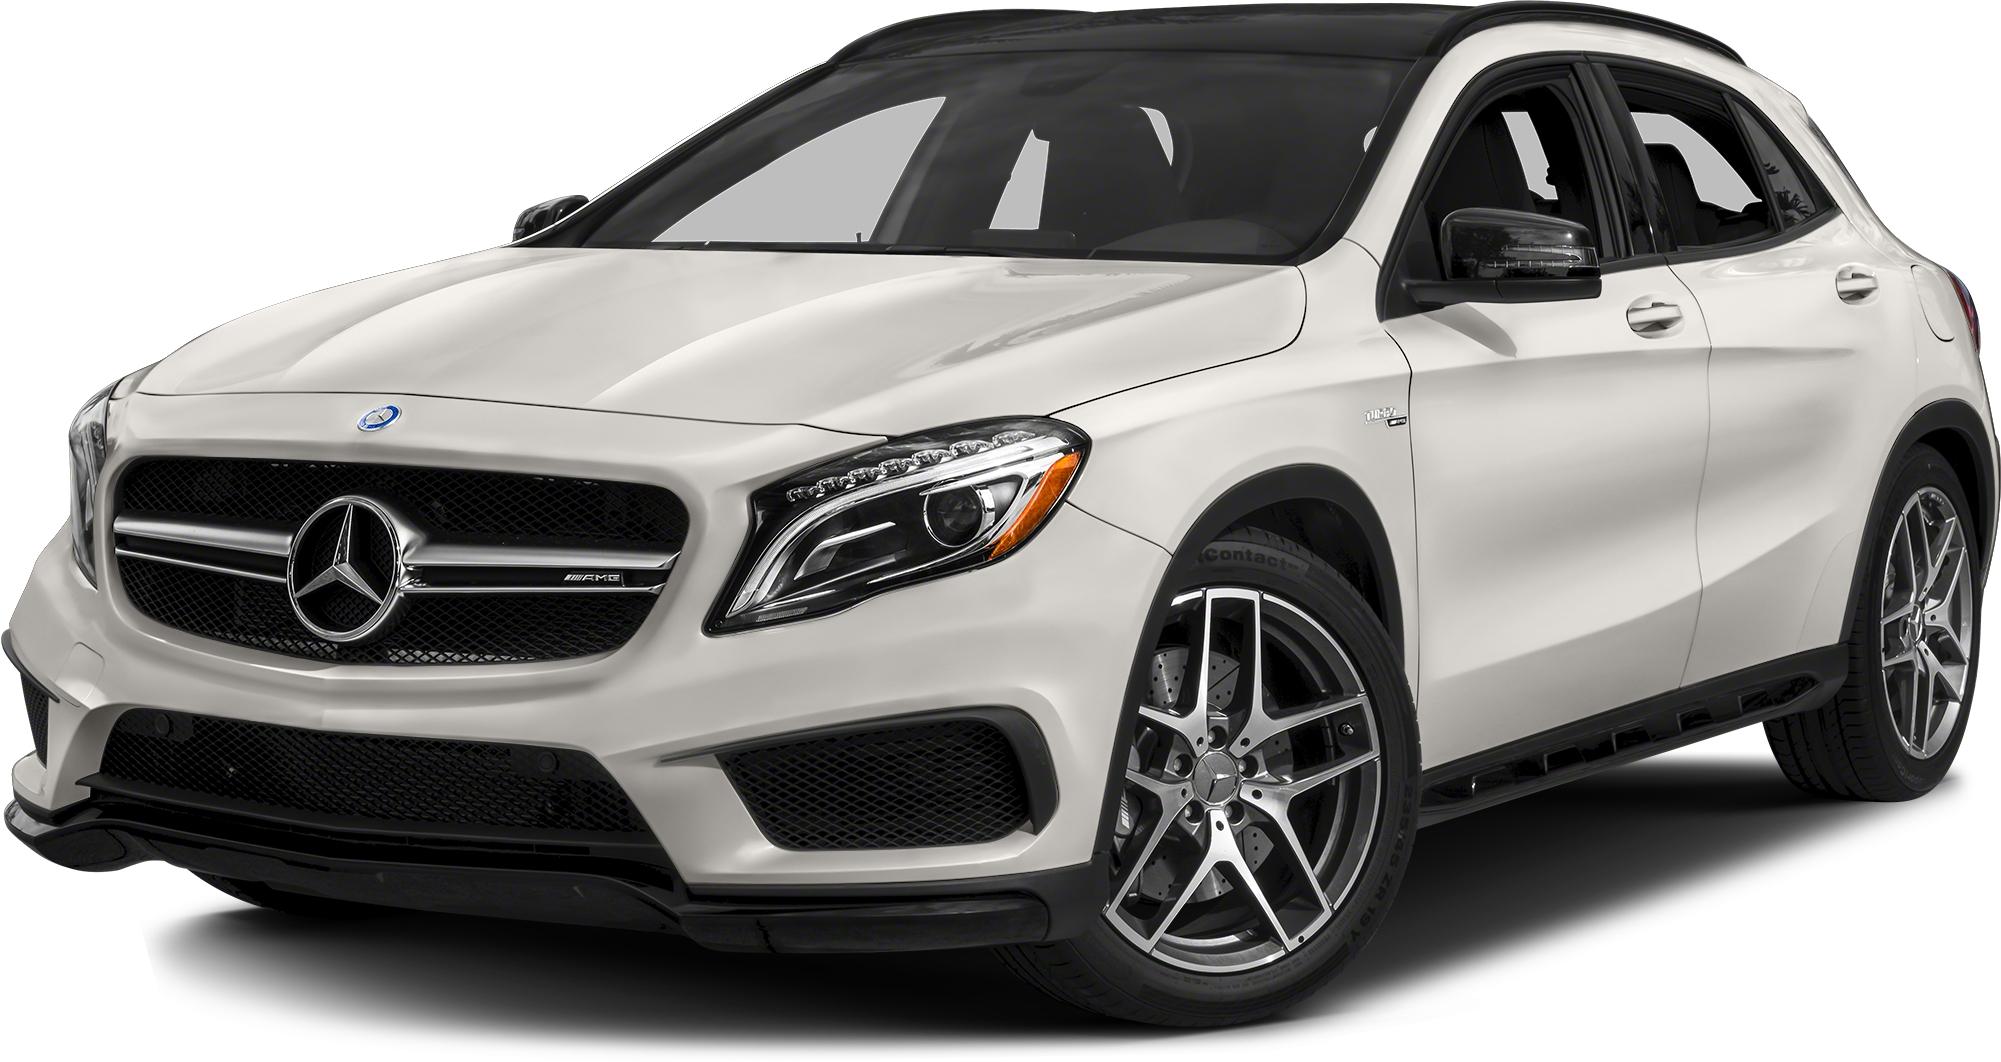 2017 mercedes benz gla amg gla45 san juan tx 14965151 for Mercedes benz san juan texas